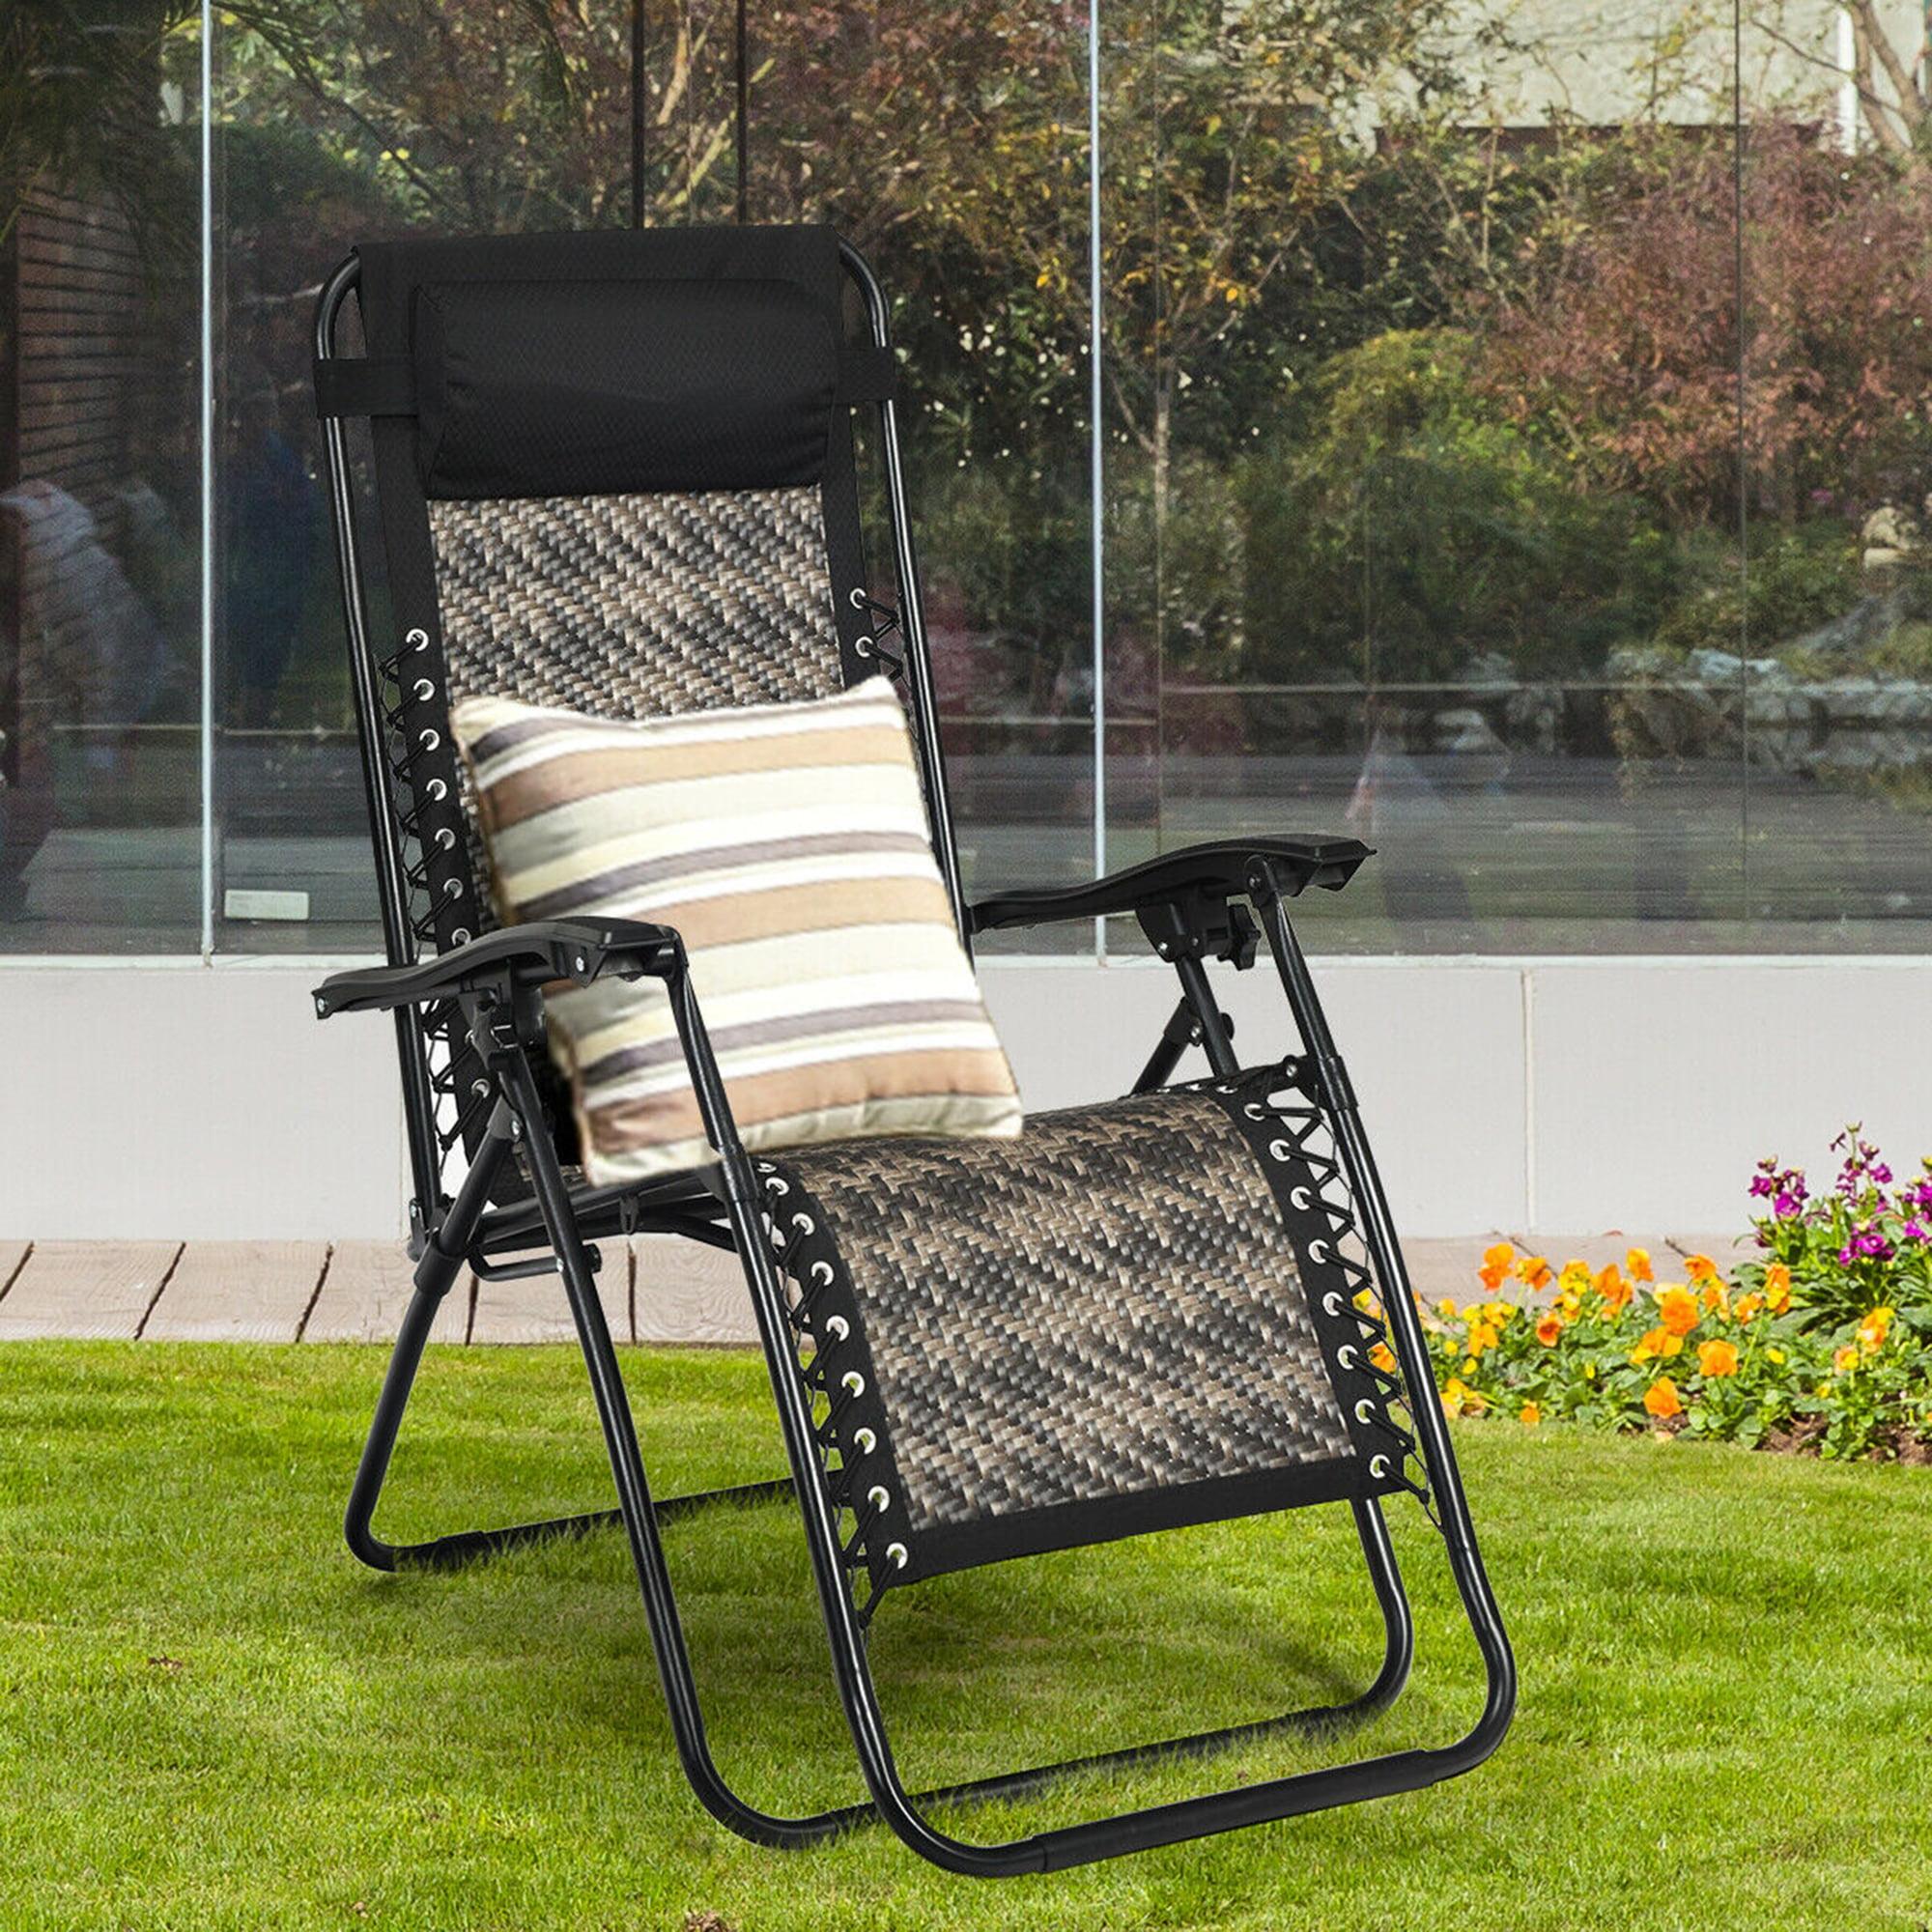 Gymax Folding Rattan Patio Zero Gravity Lounge Chair Recliner with Headrest    Walmart.com